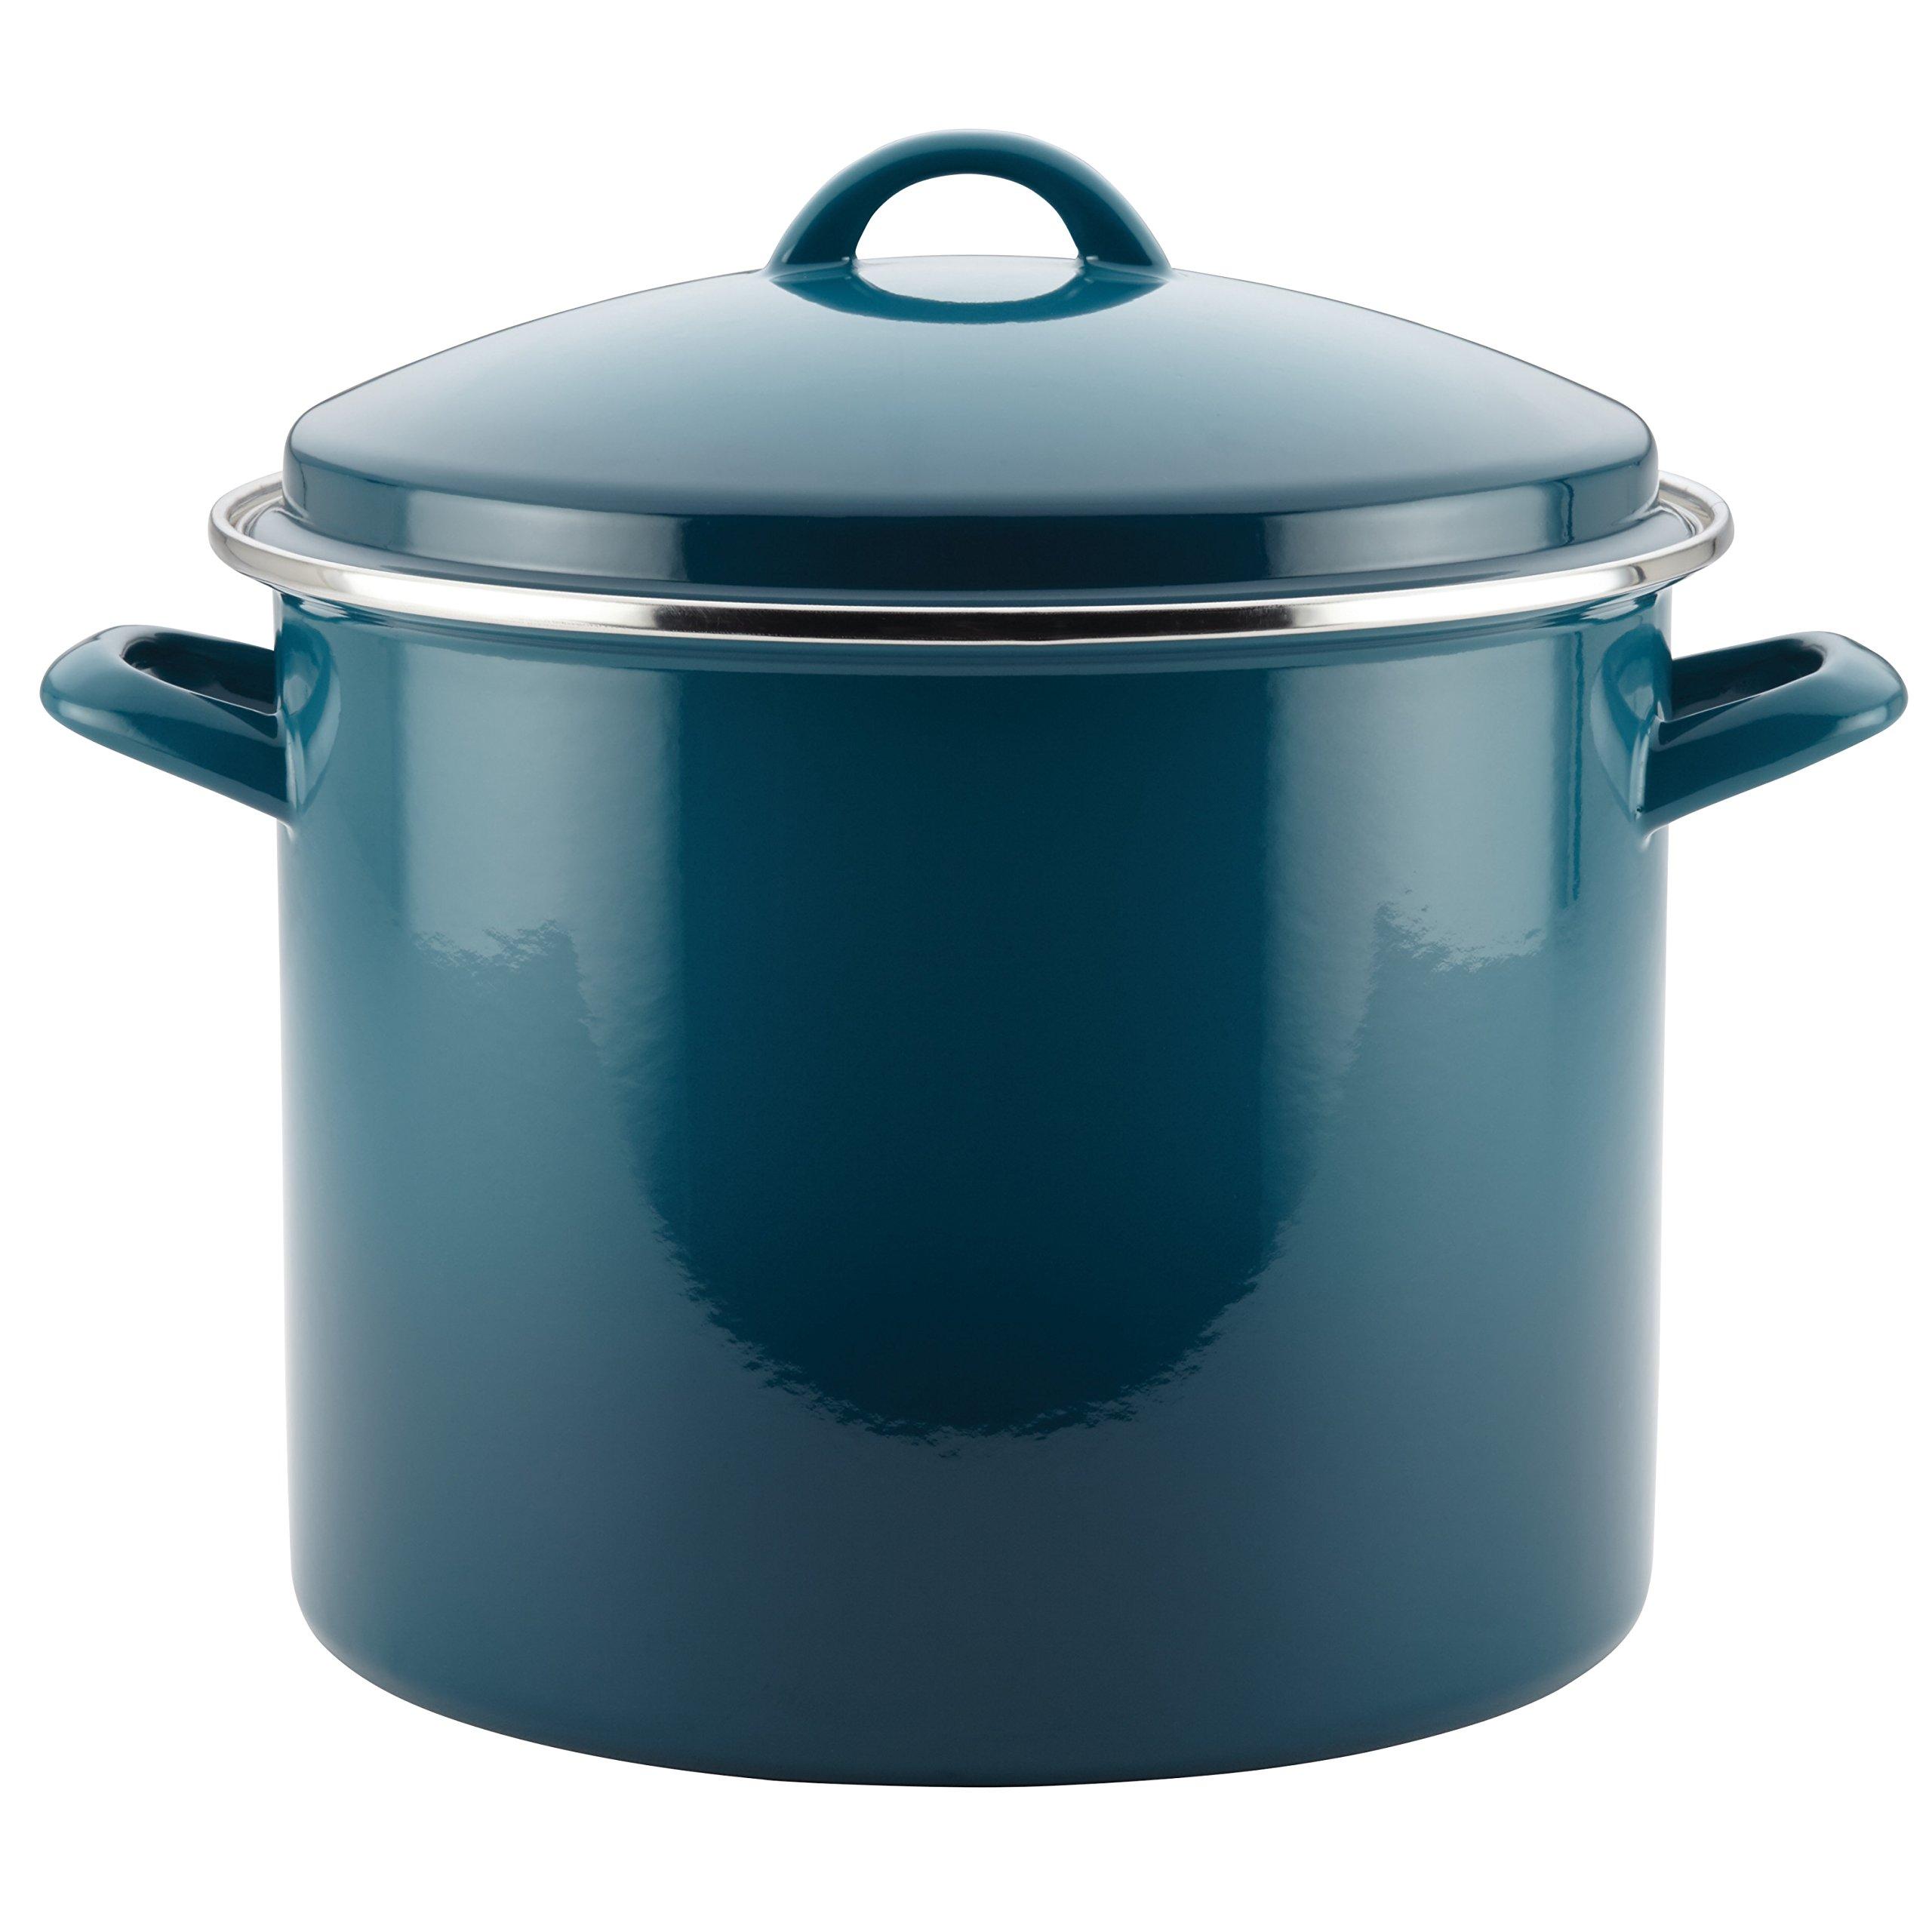 Rachael Ray 46326 Enamel On Steel Stockpot, 12 quart, Marine Blue by Rachael Ray